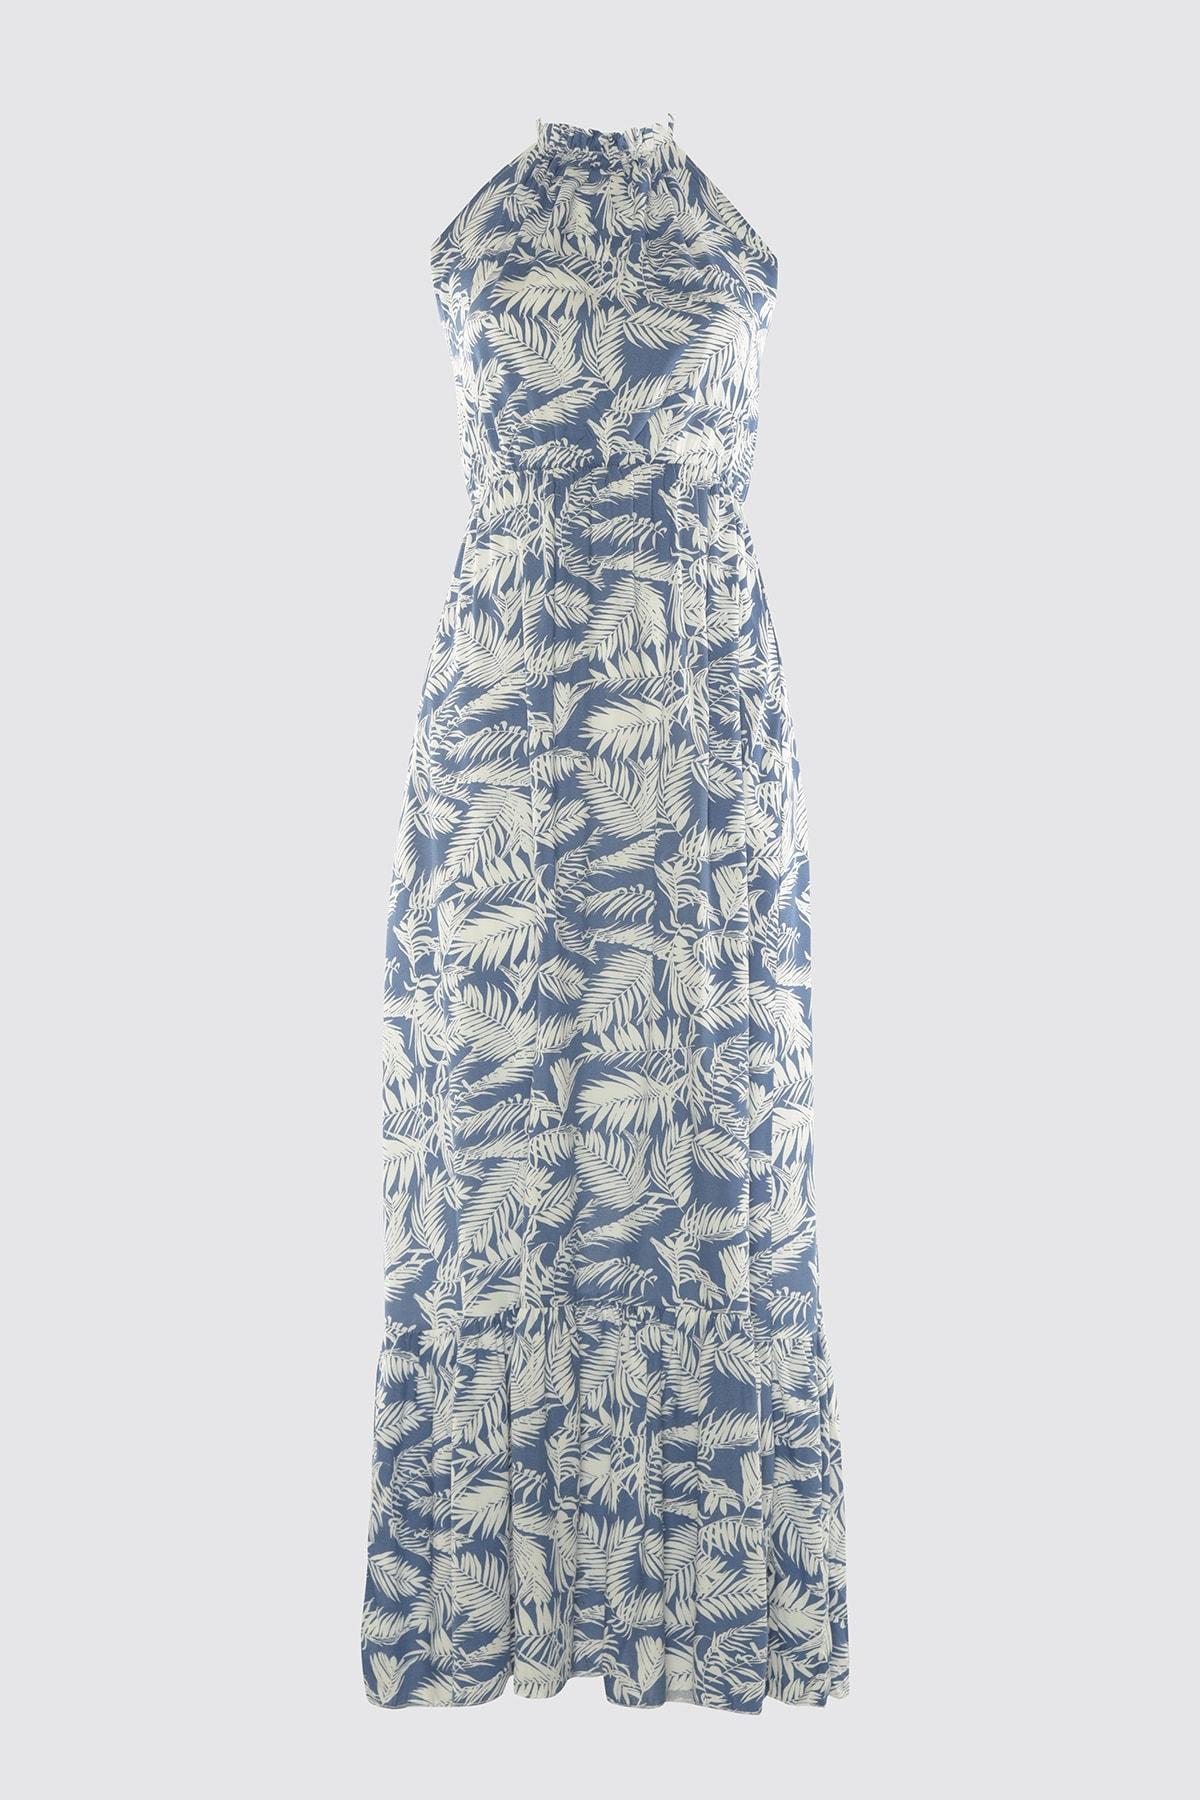 Trendyol Flounces Halter-Neck Dress TWOSS20EL2142